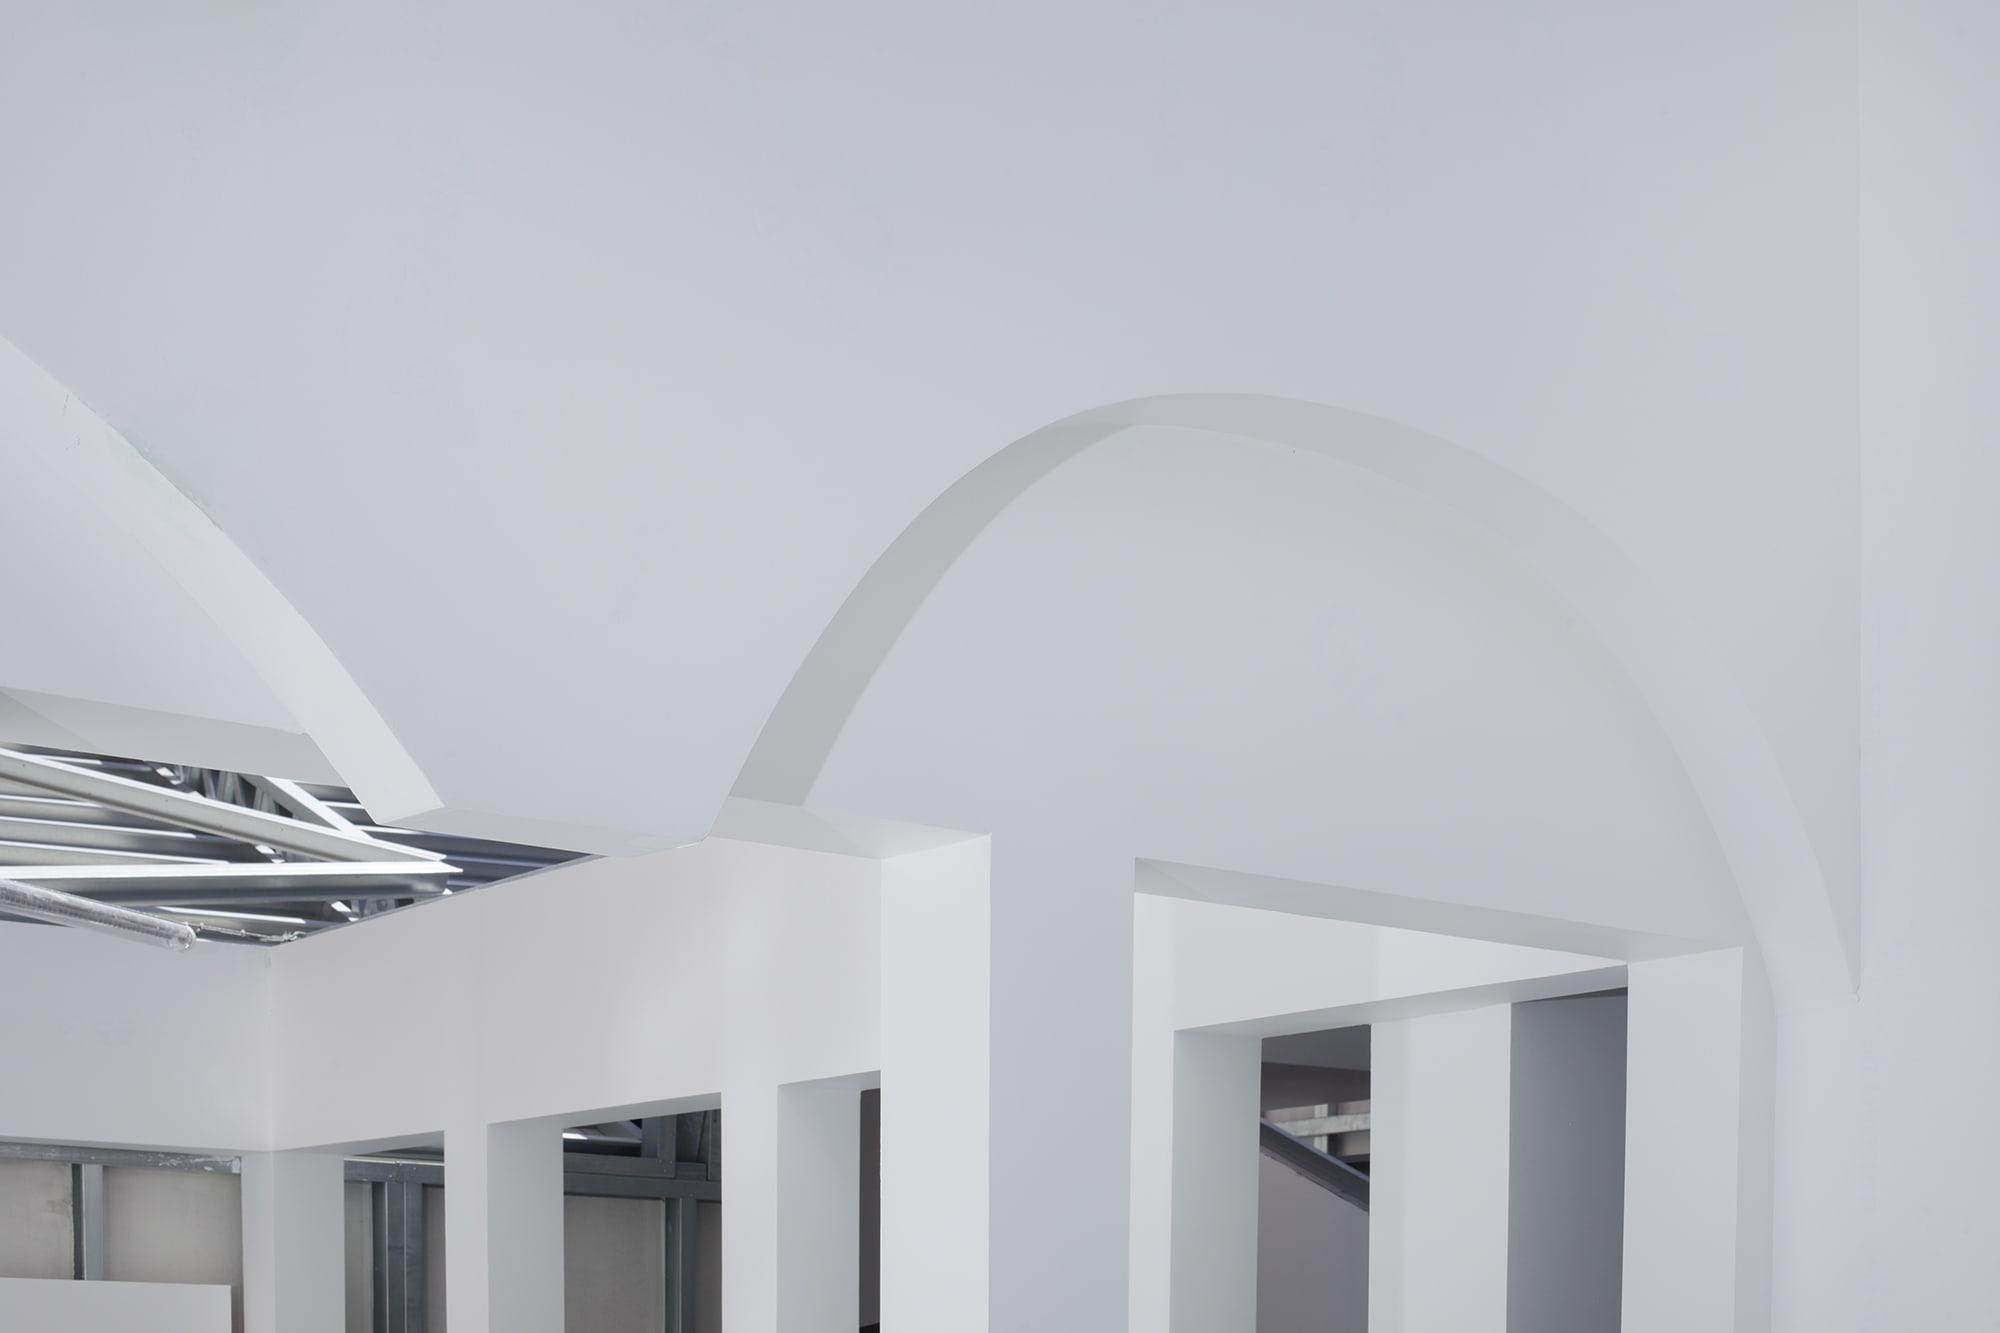 Diogo Seixas Lopes, Tiago Casanova · Lisbon Architecture Triennale